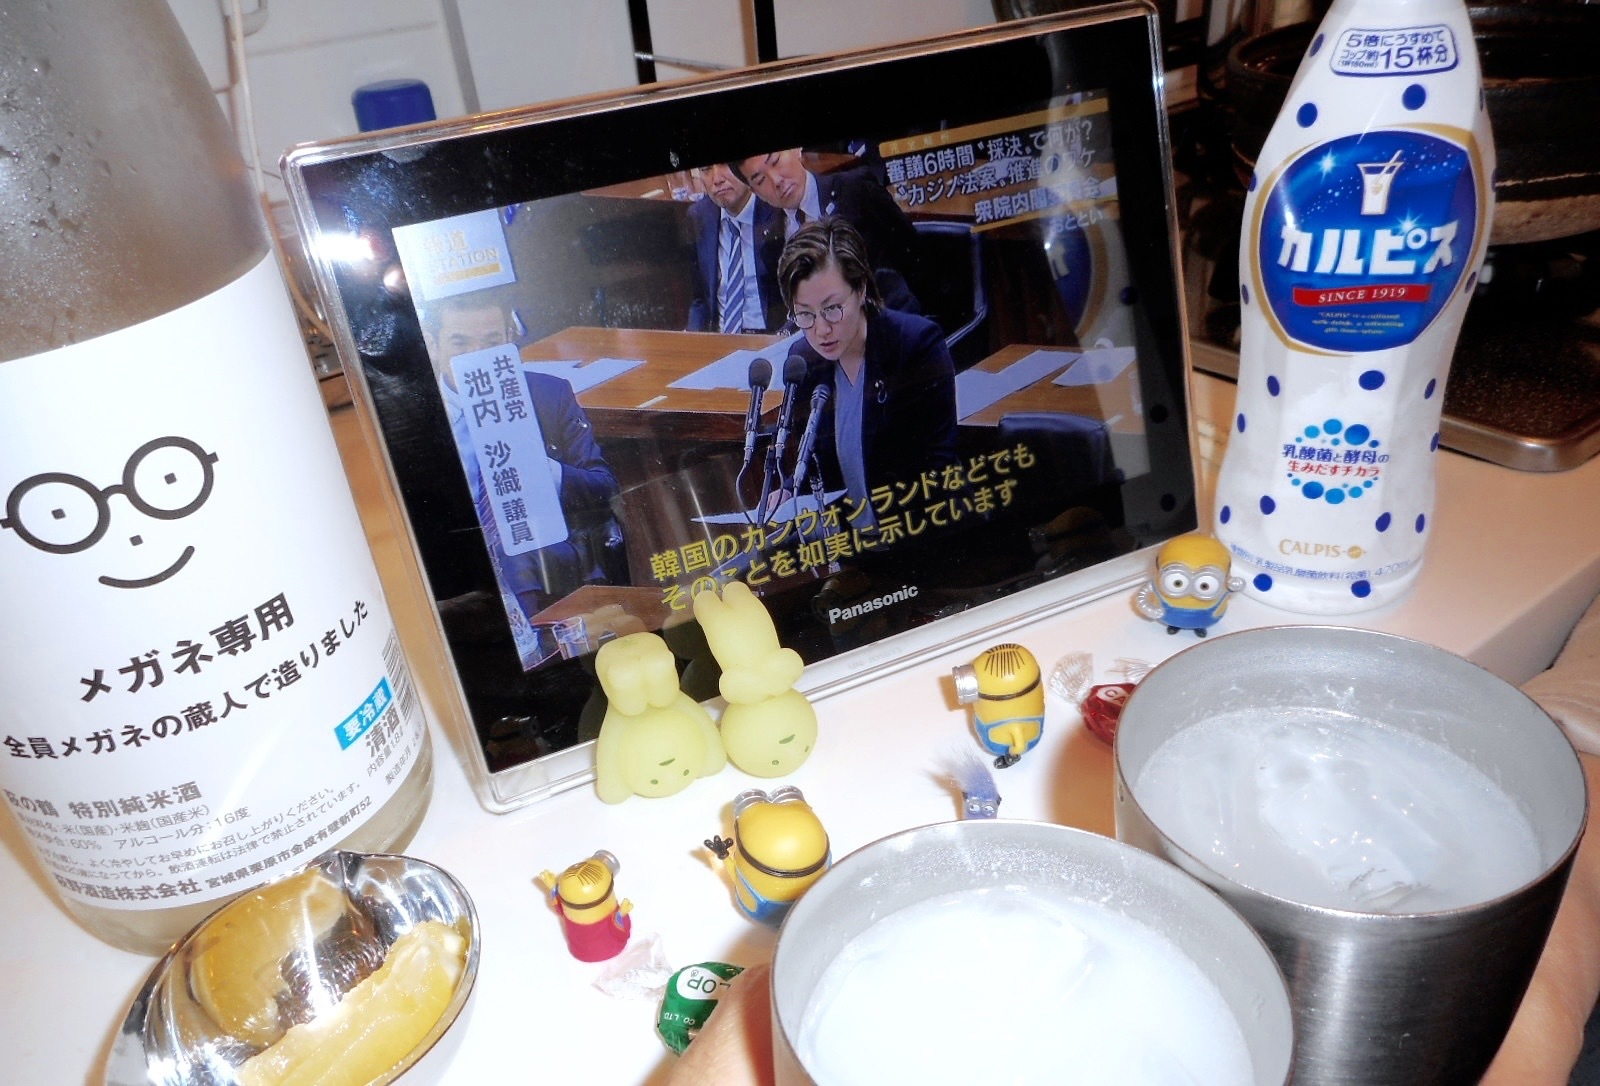 haginotsuru_megane27by23.jpg